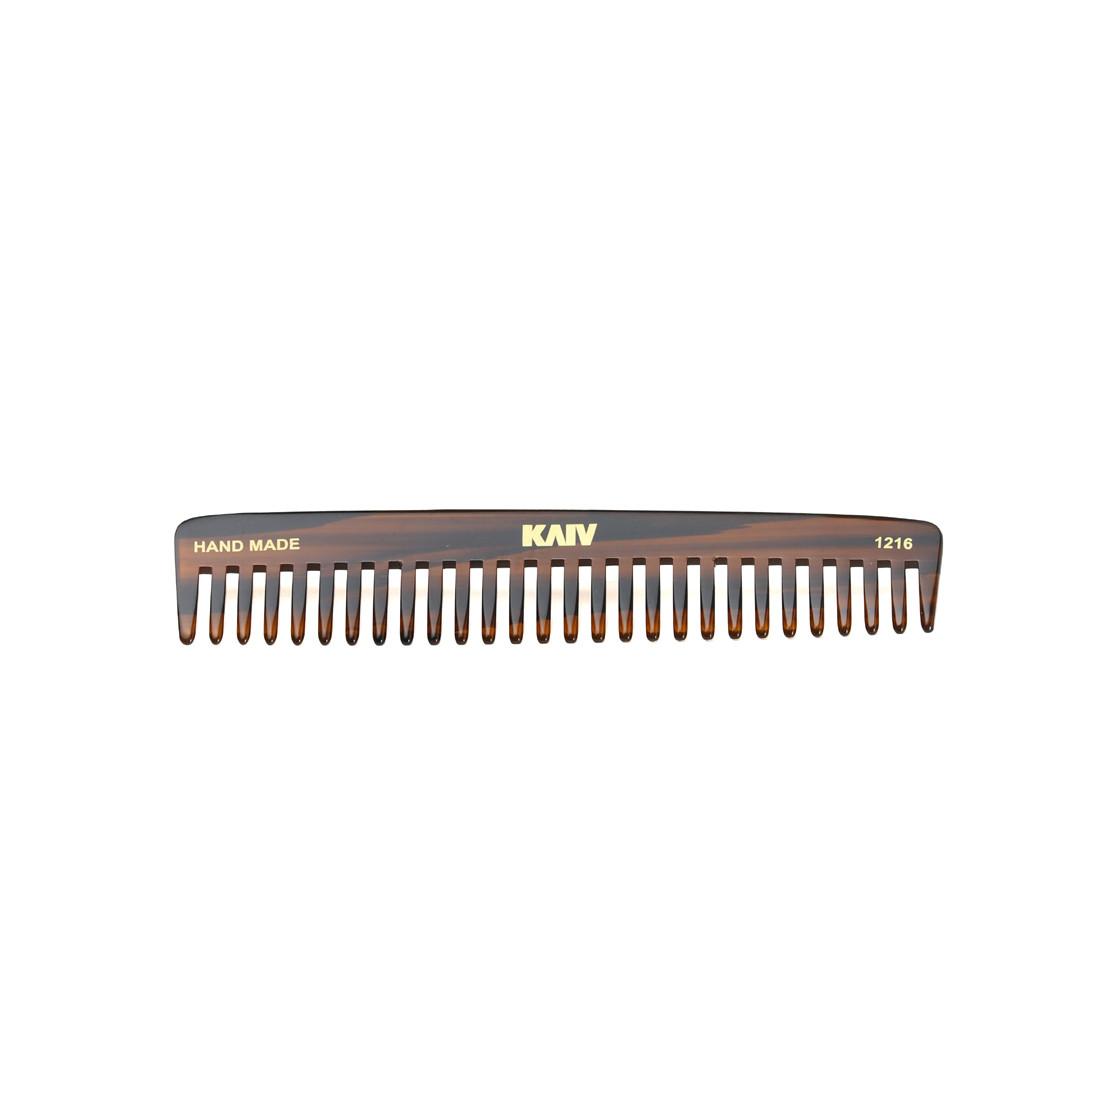 Kaiv Wide Theeth Handmade Grooming Comb